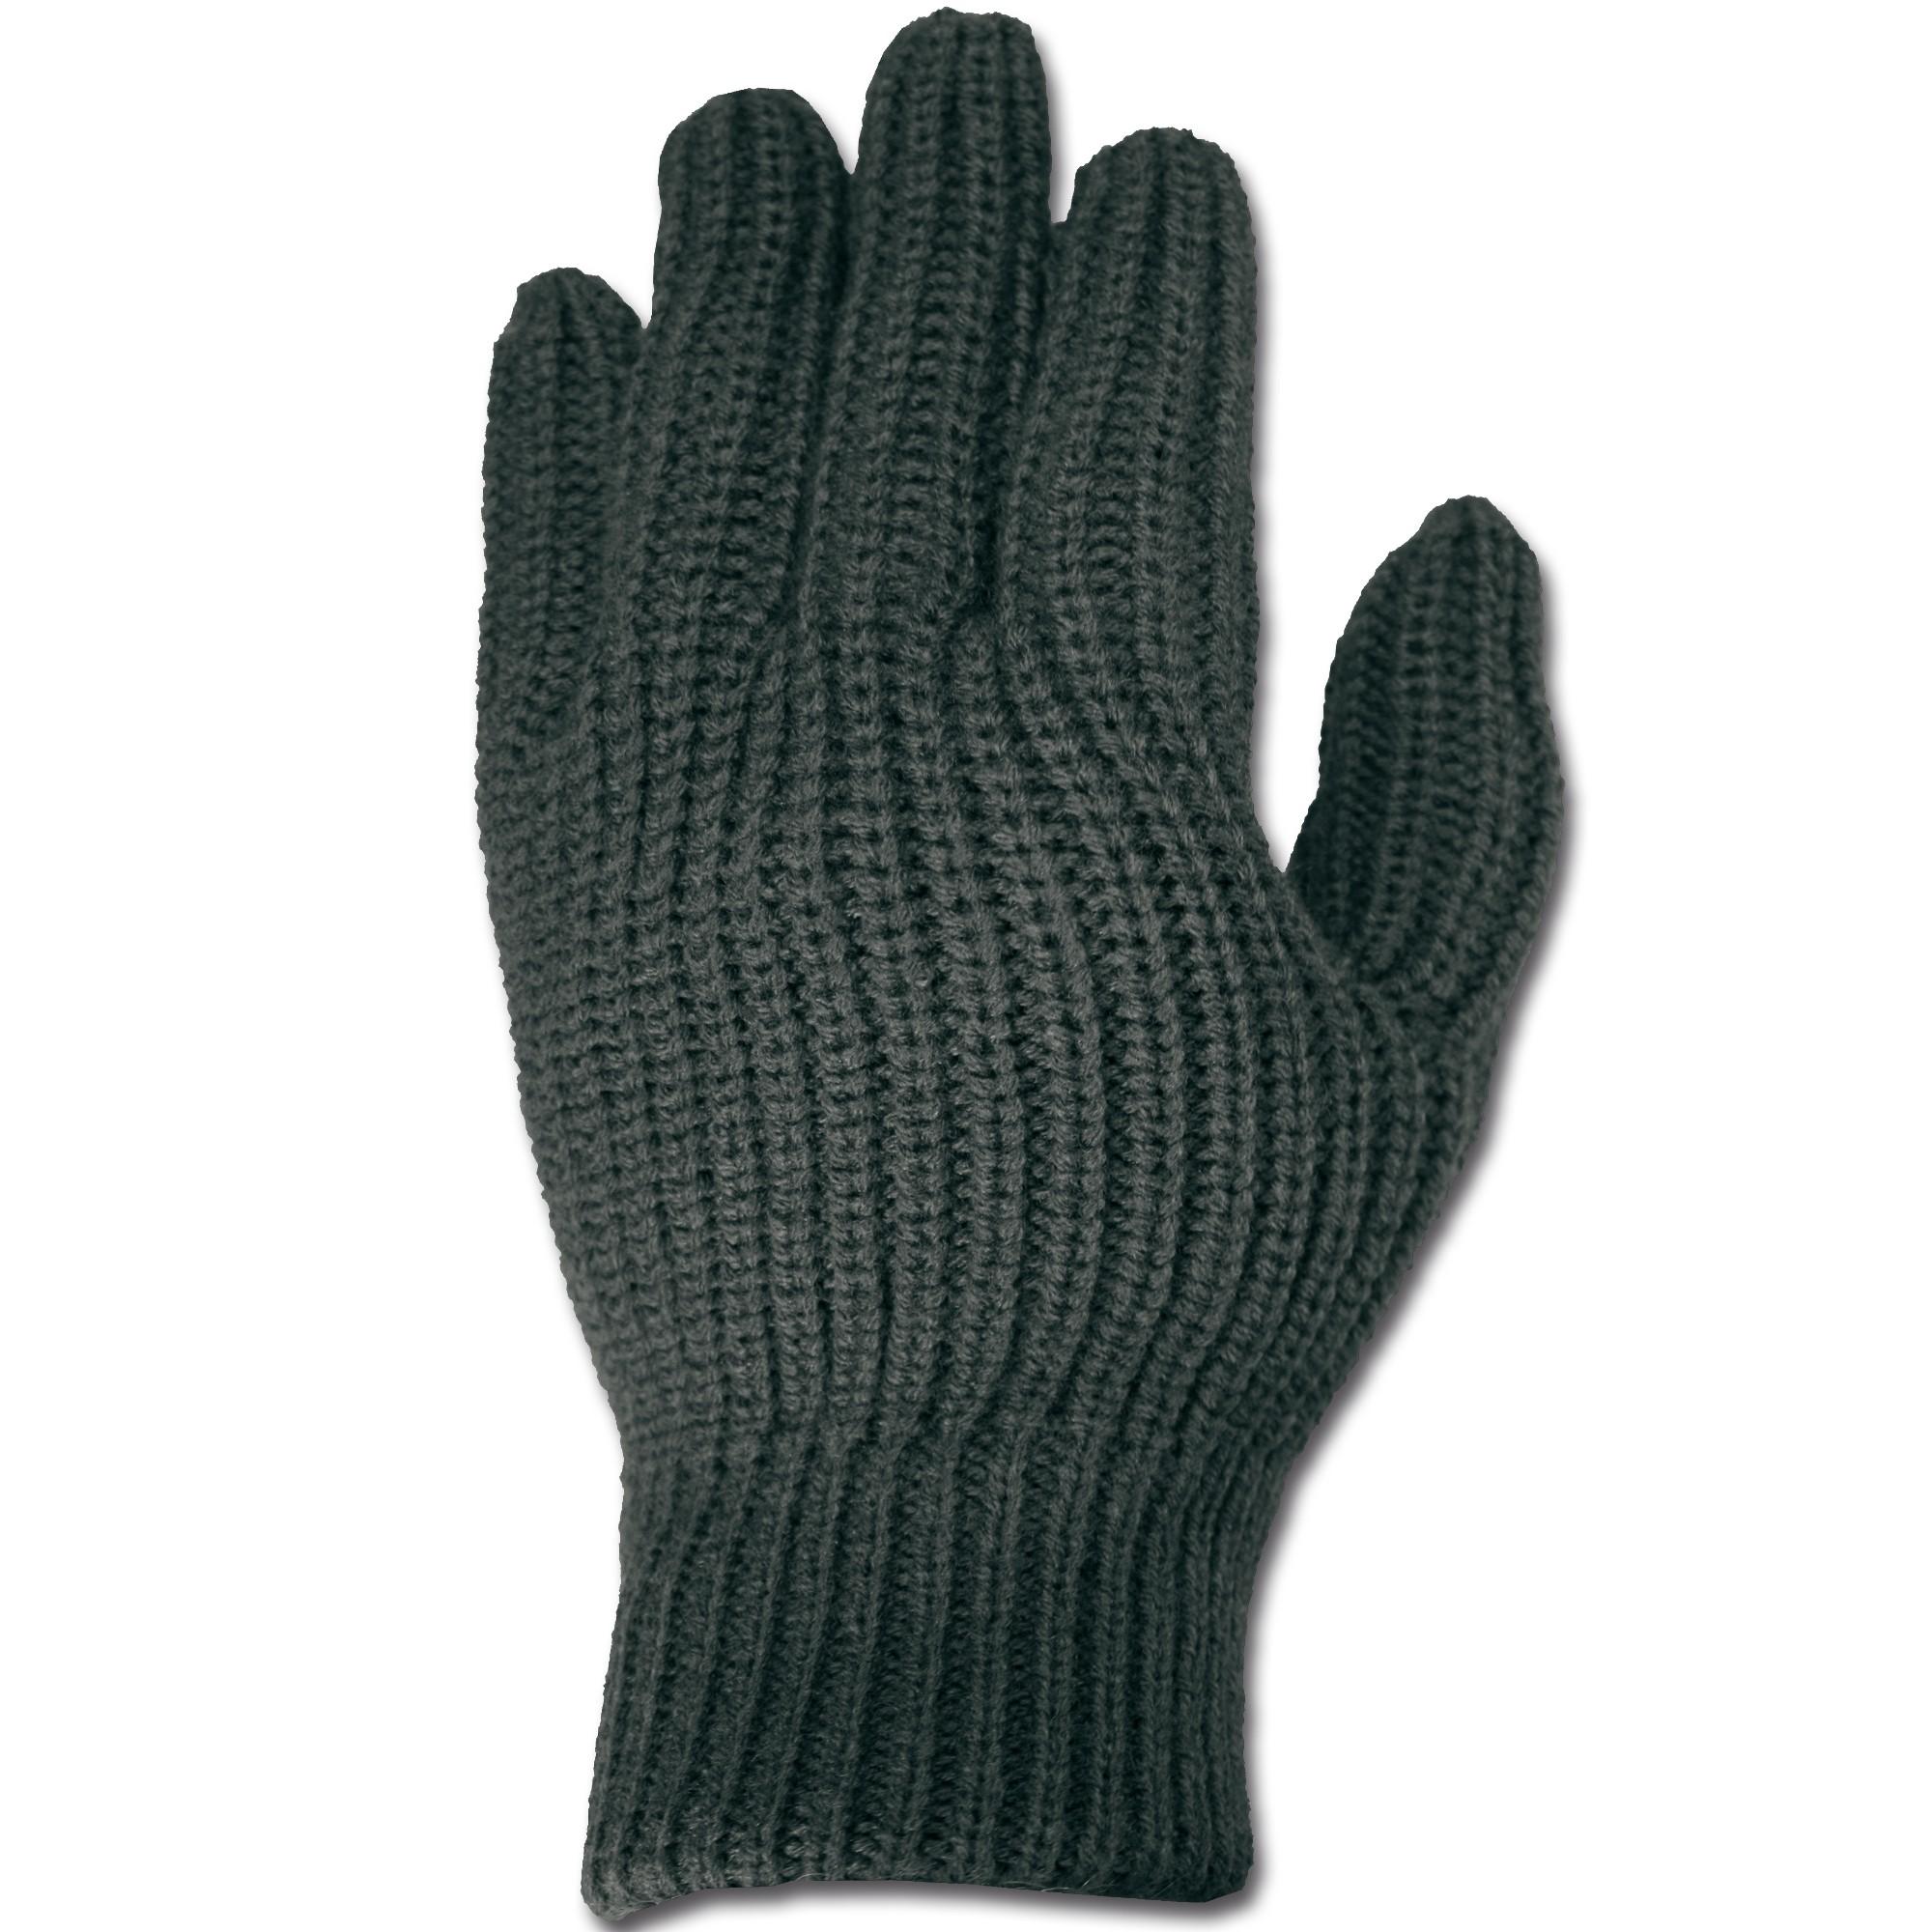 Fingerhandschuhe Acryl schwarz